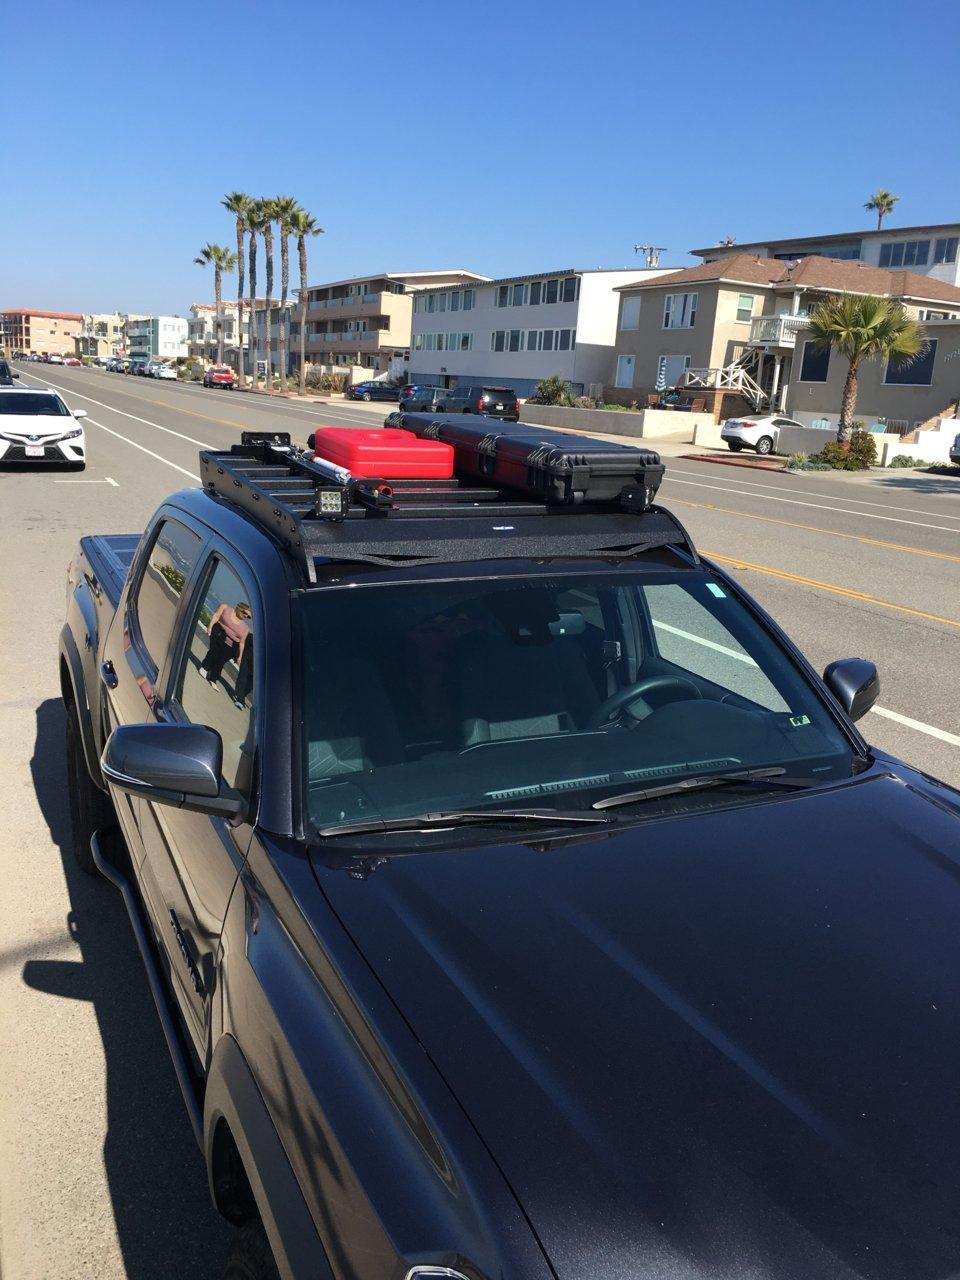 hooke road roof rack ubox